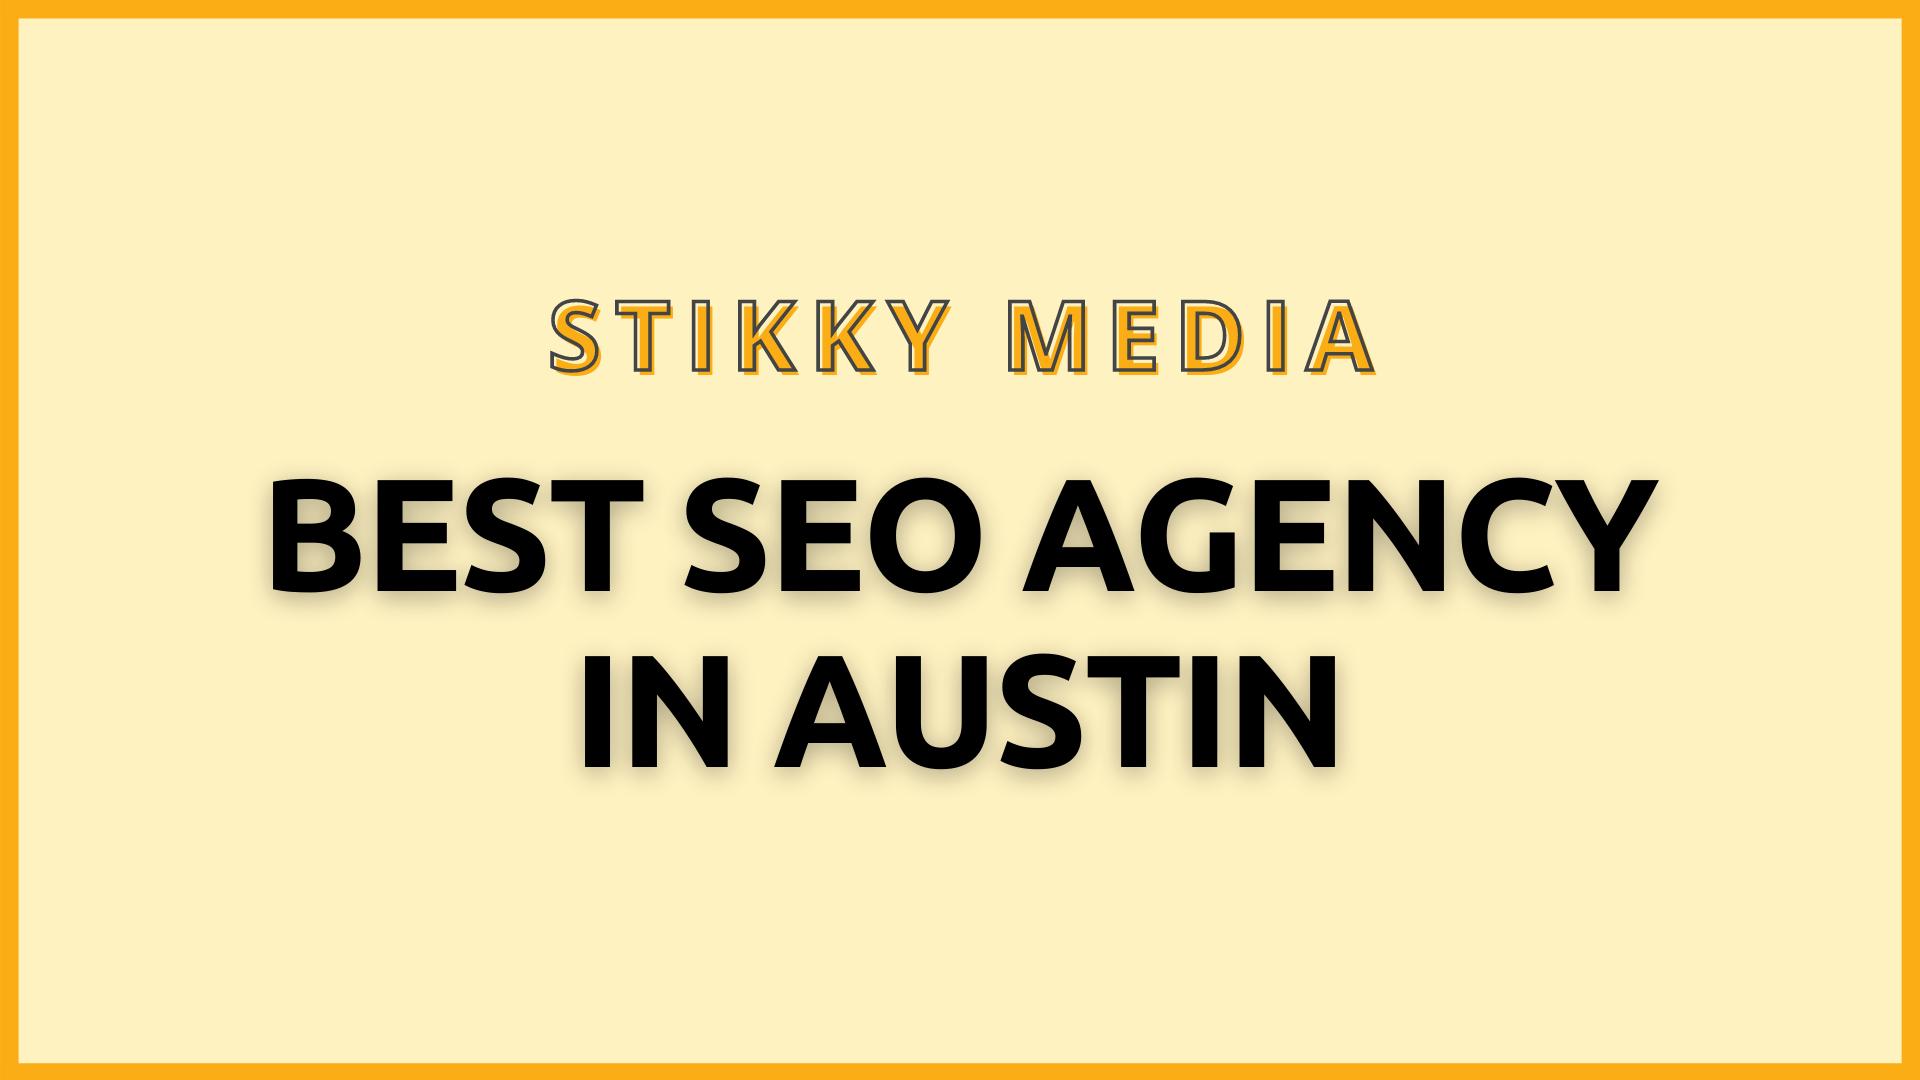 SEO services in Austin - Stikky Media